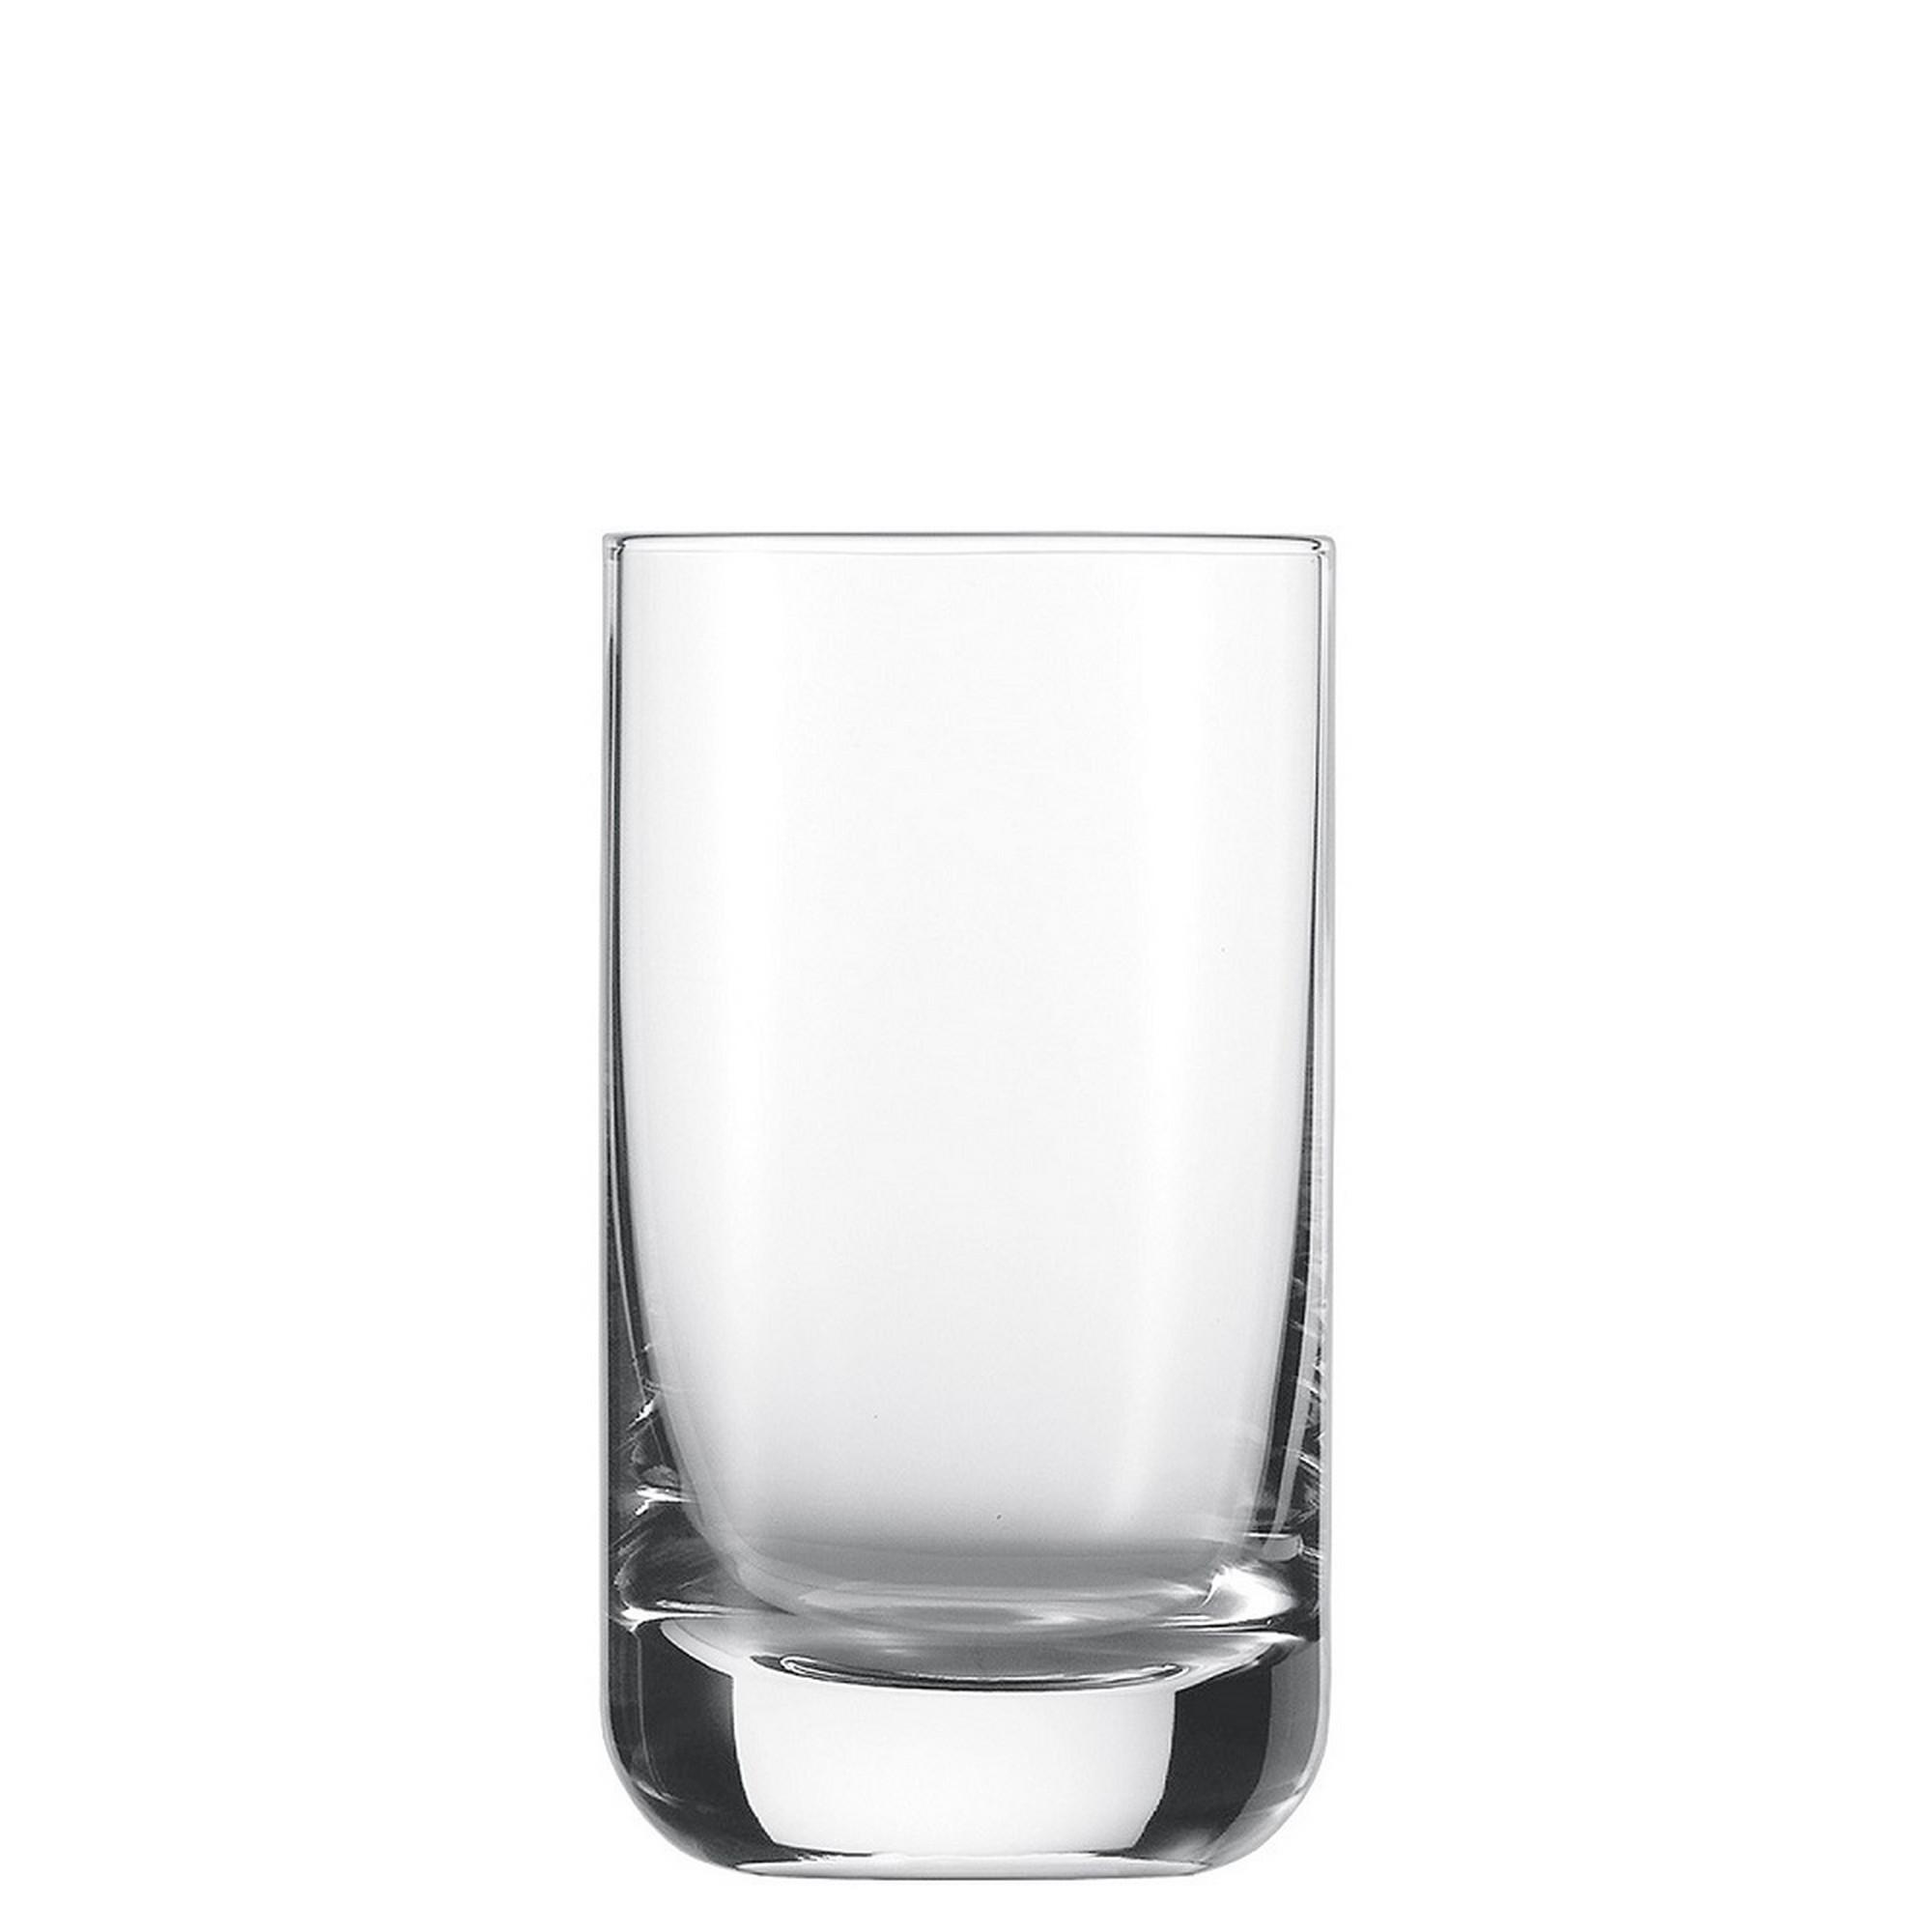 Copo para Água e Suco 255ml Schott Zwiesel Convention 6 Peças de Cristal